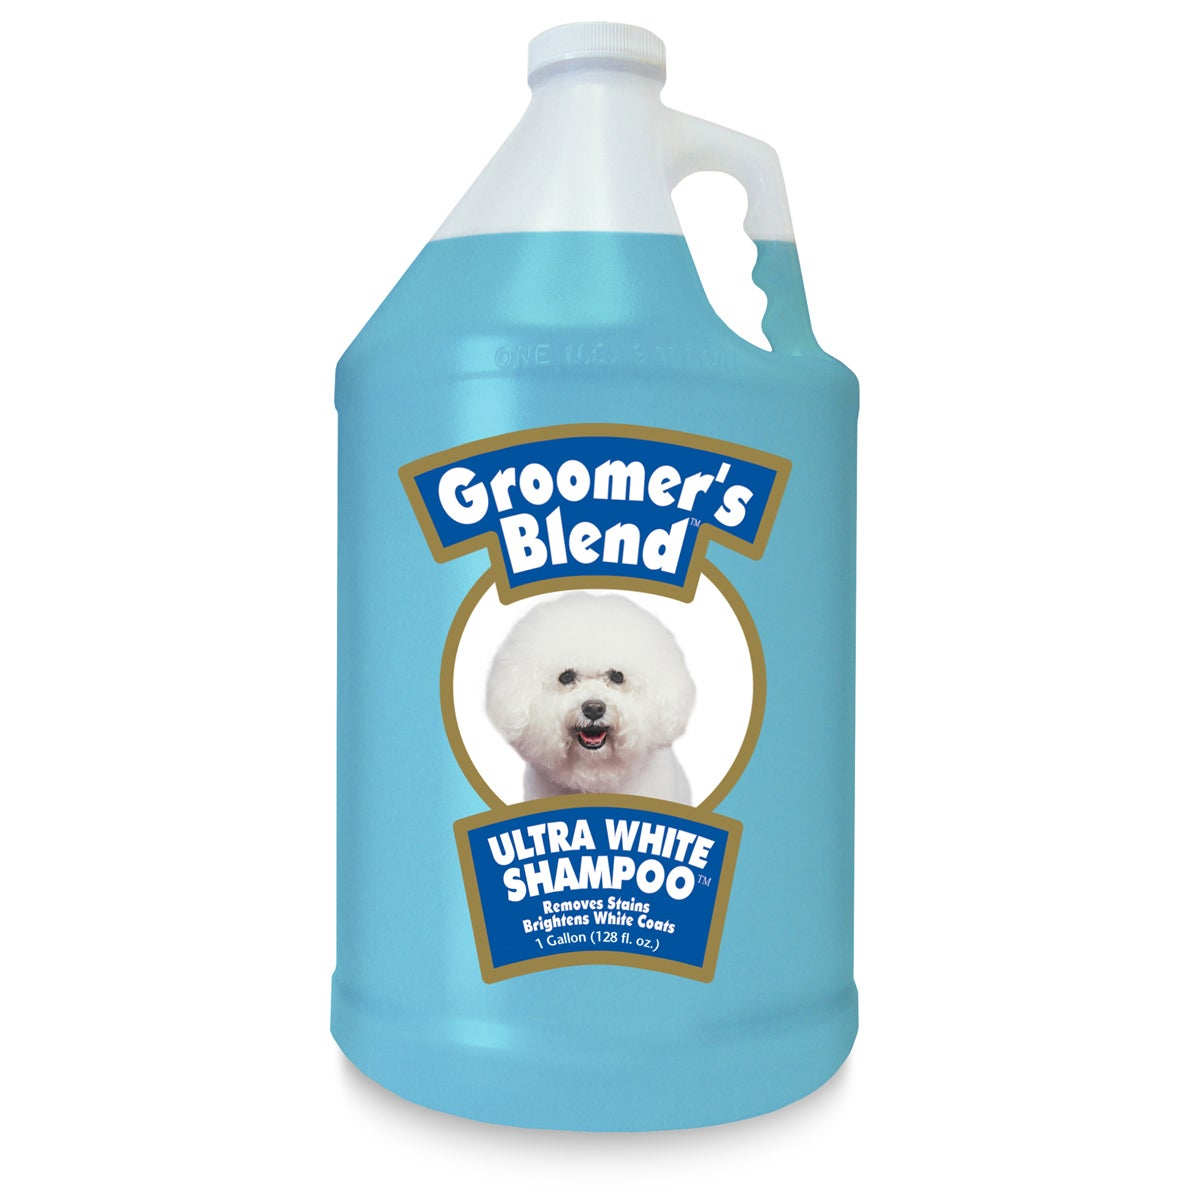 Groomer's Blend Ultra White Shampoo - 1 Gallon